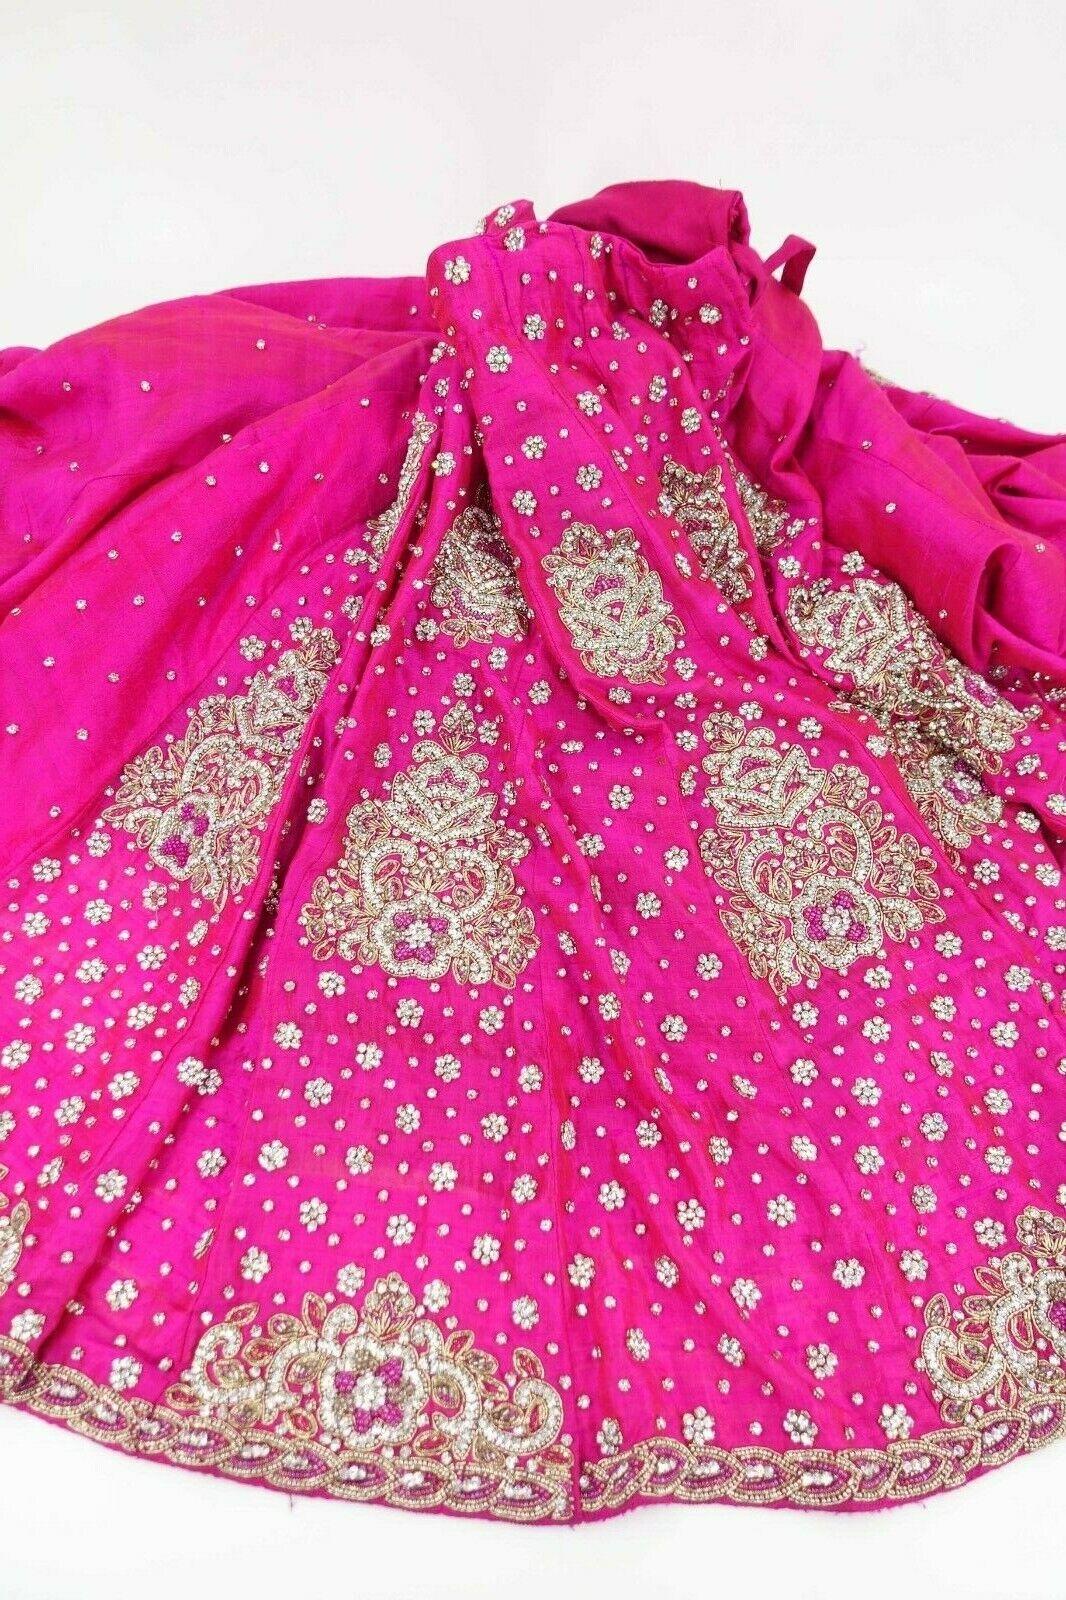 Pink raw silk short heavy Indian short bollywood Lengha choli skirt SKU17548